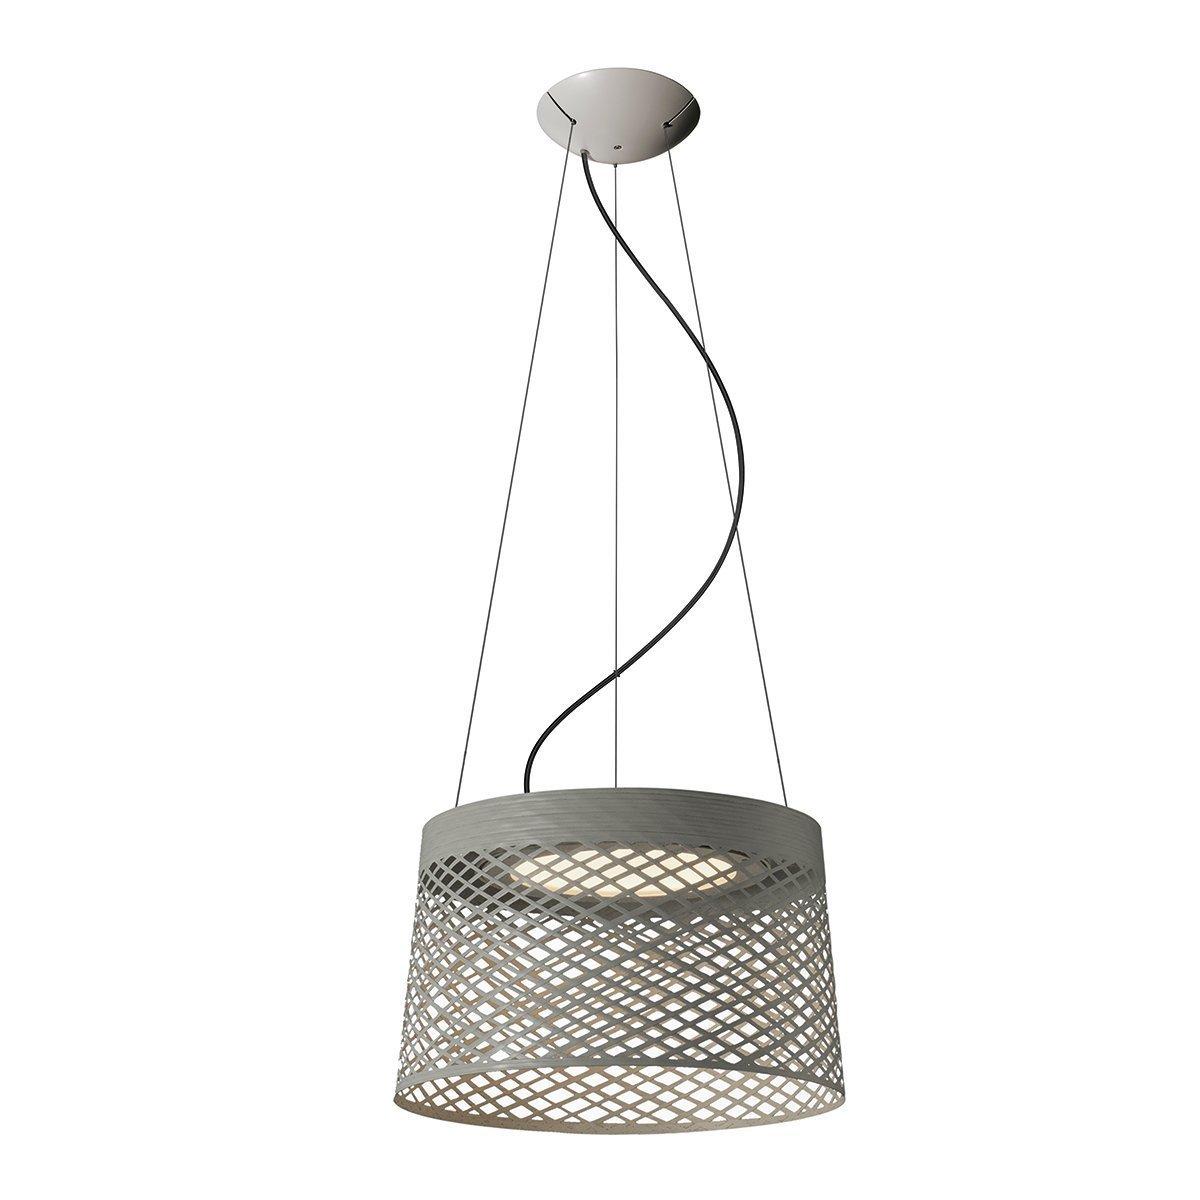 Foscarini Twiggy Grid Outdoor Hanglamp - Grijs